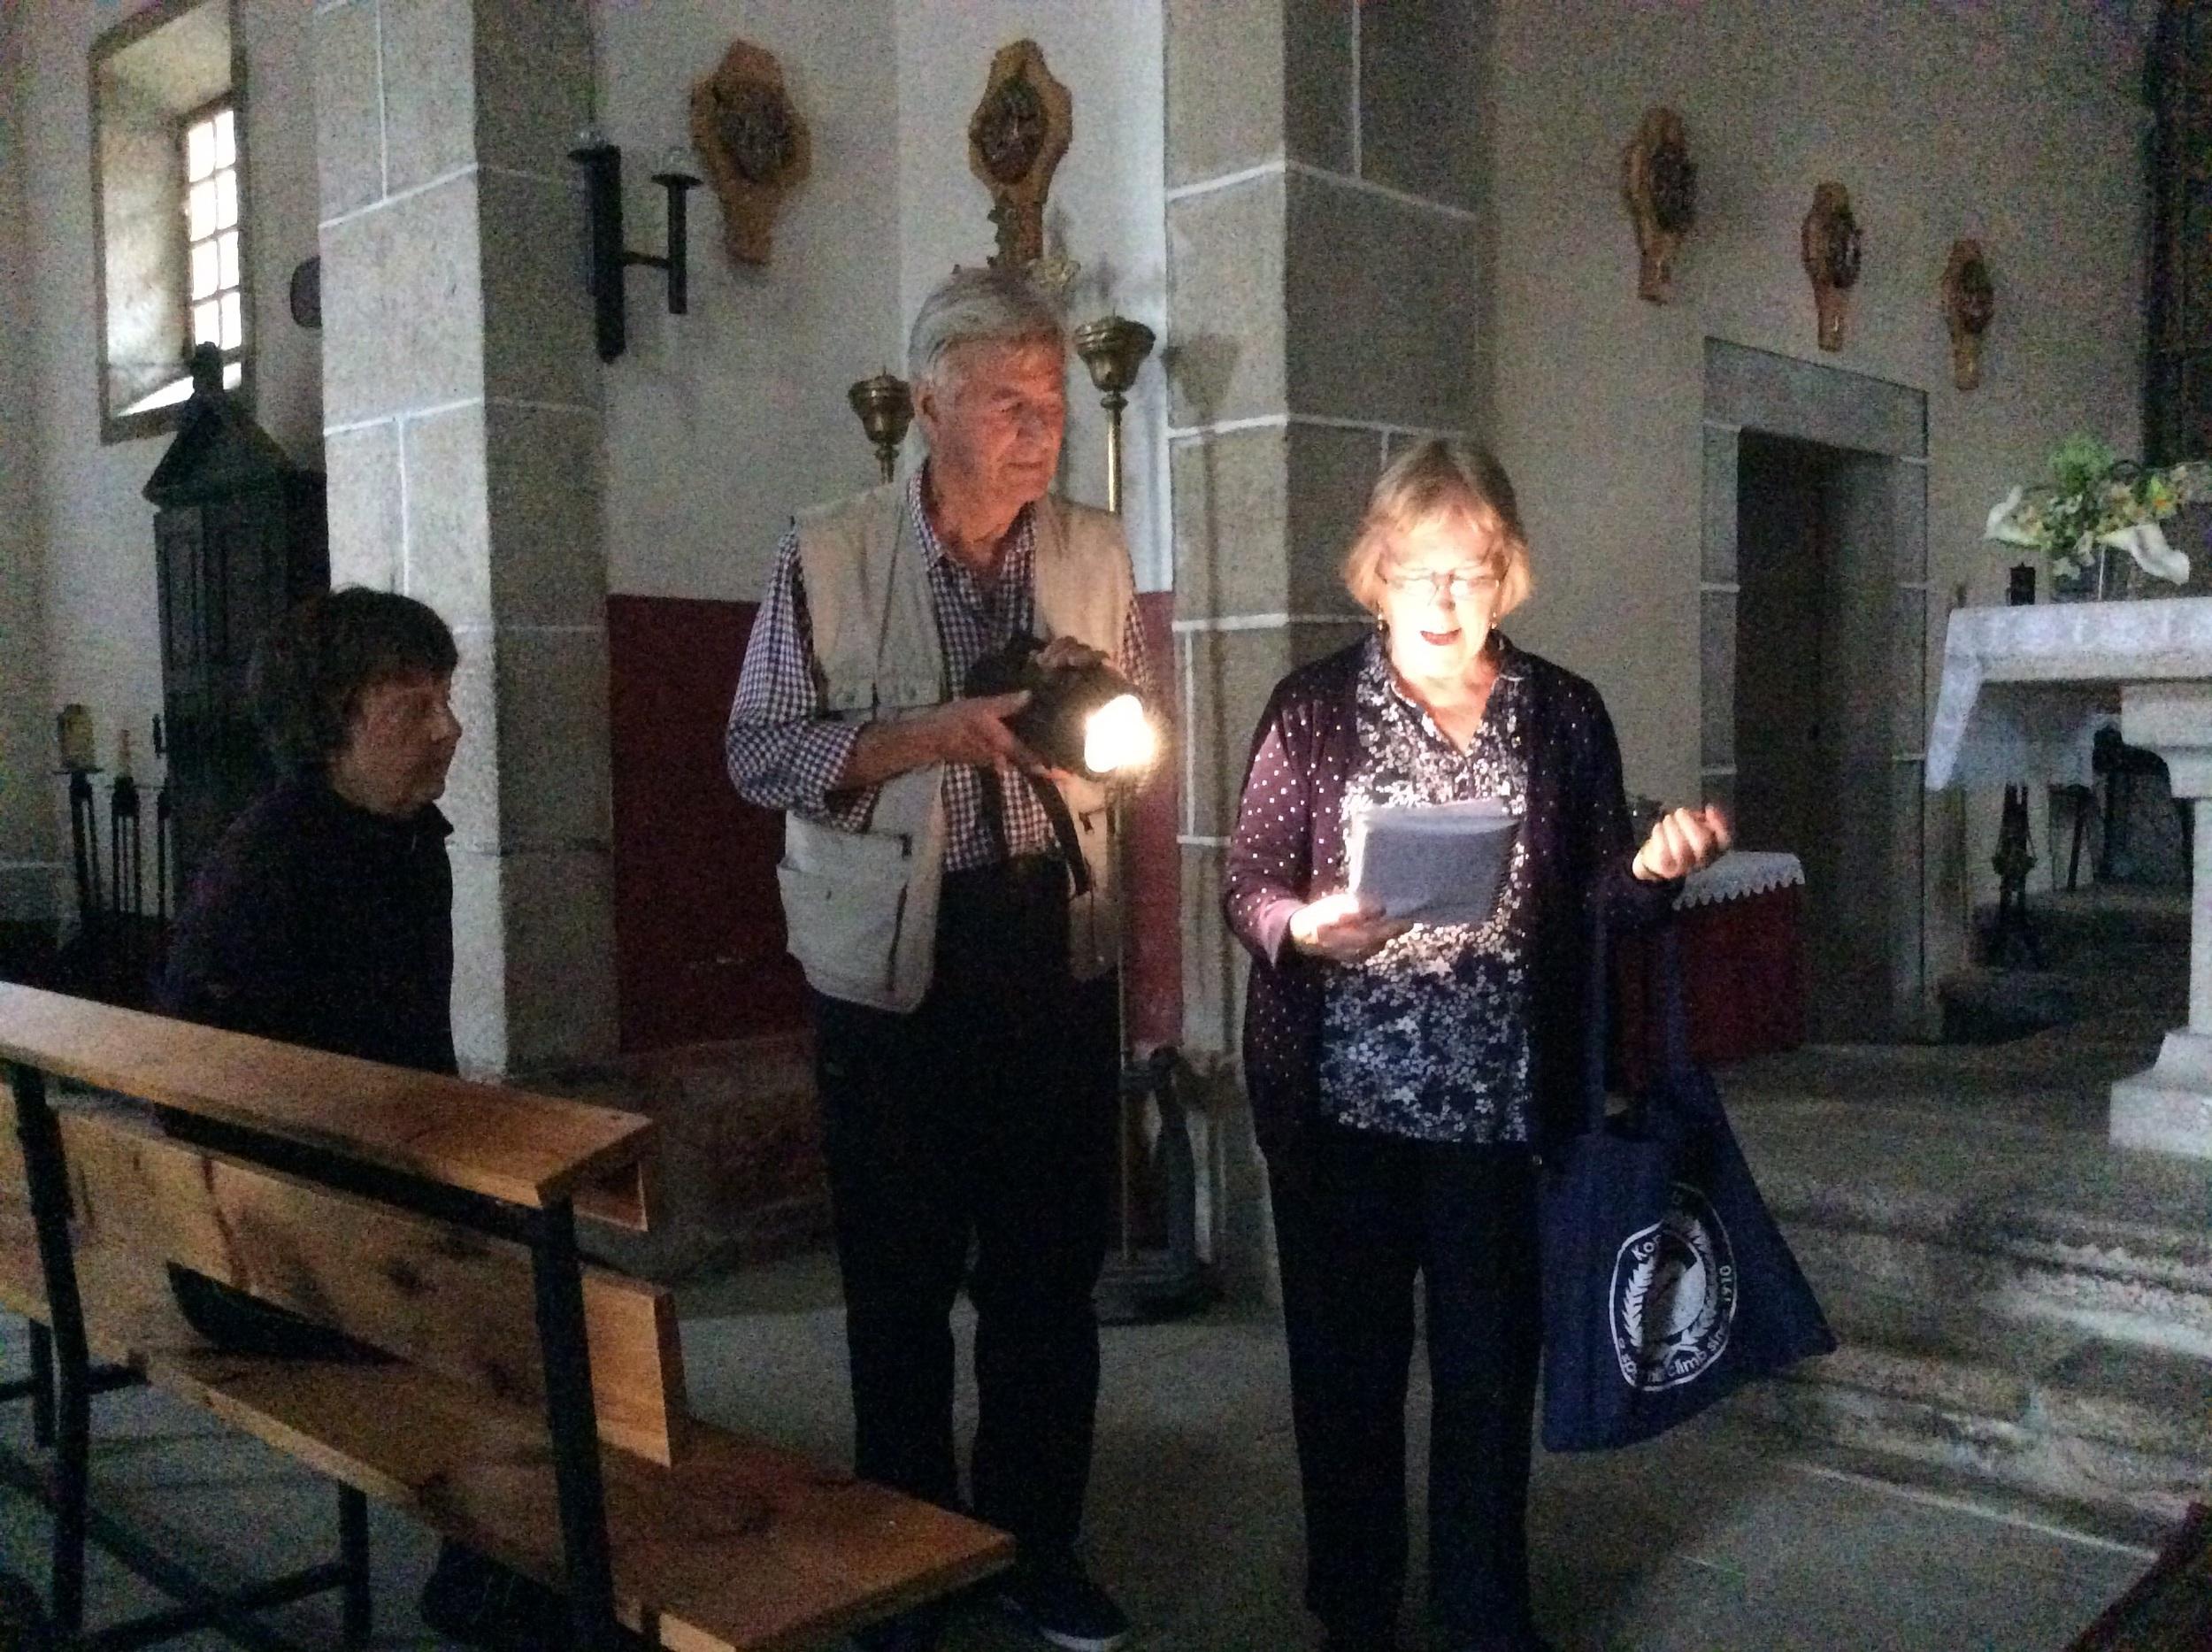 Church tour and prayer